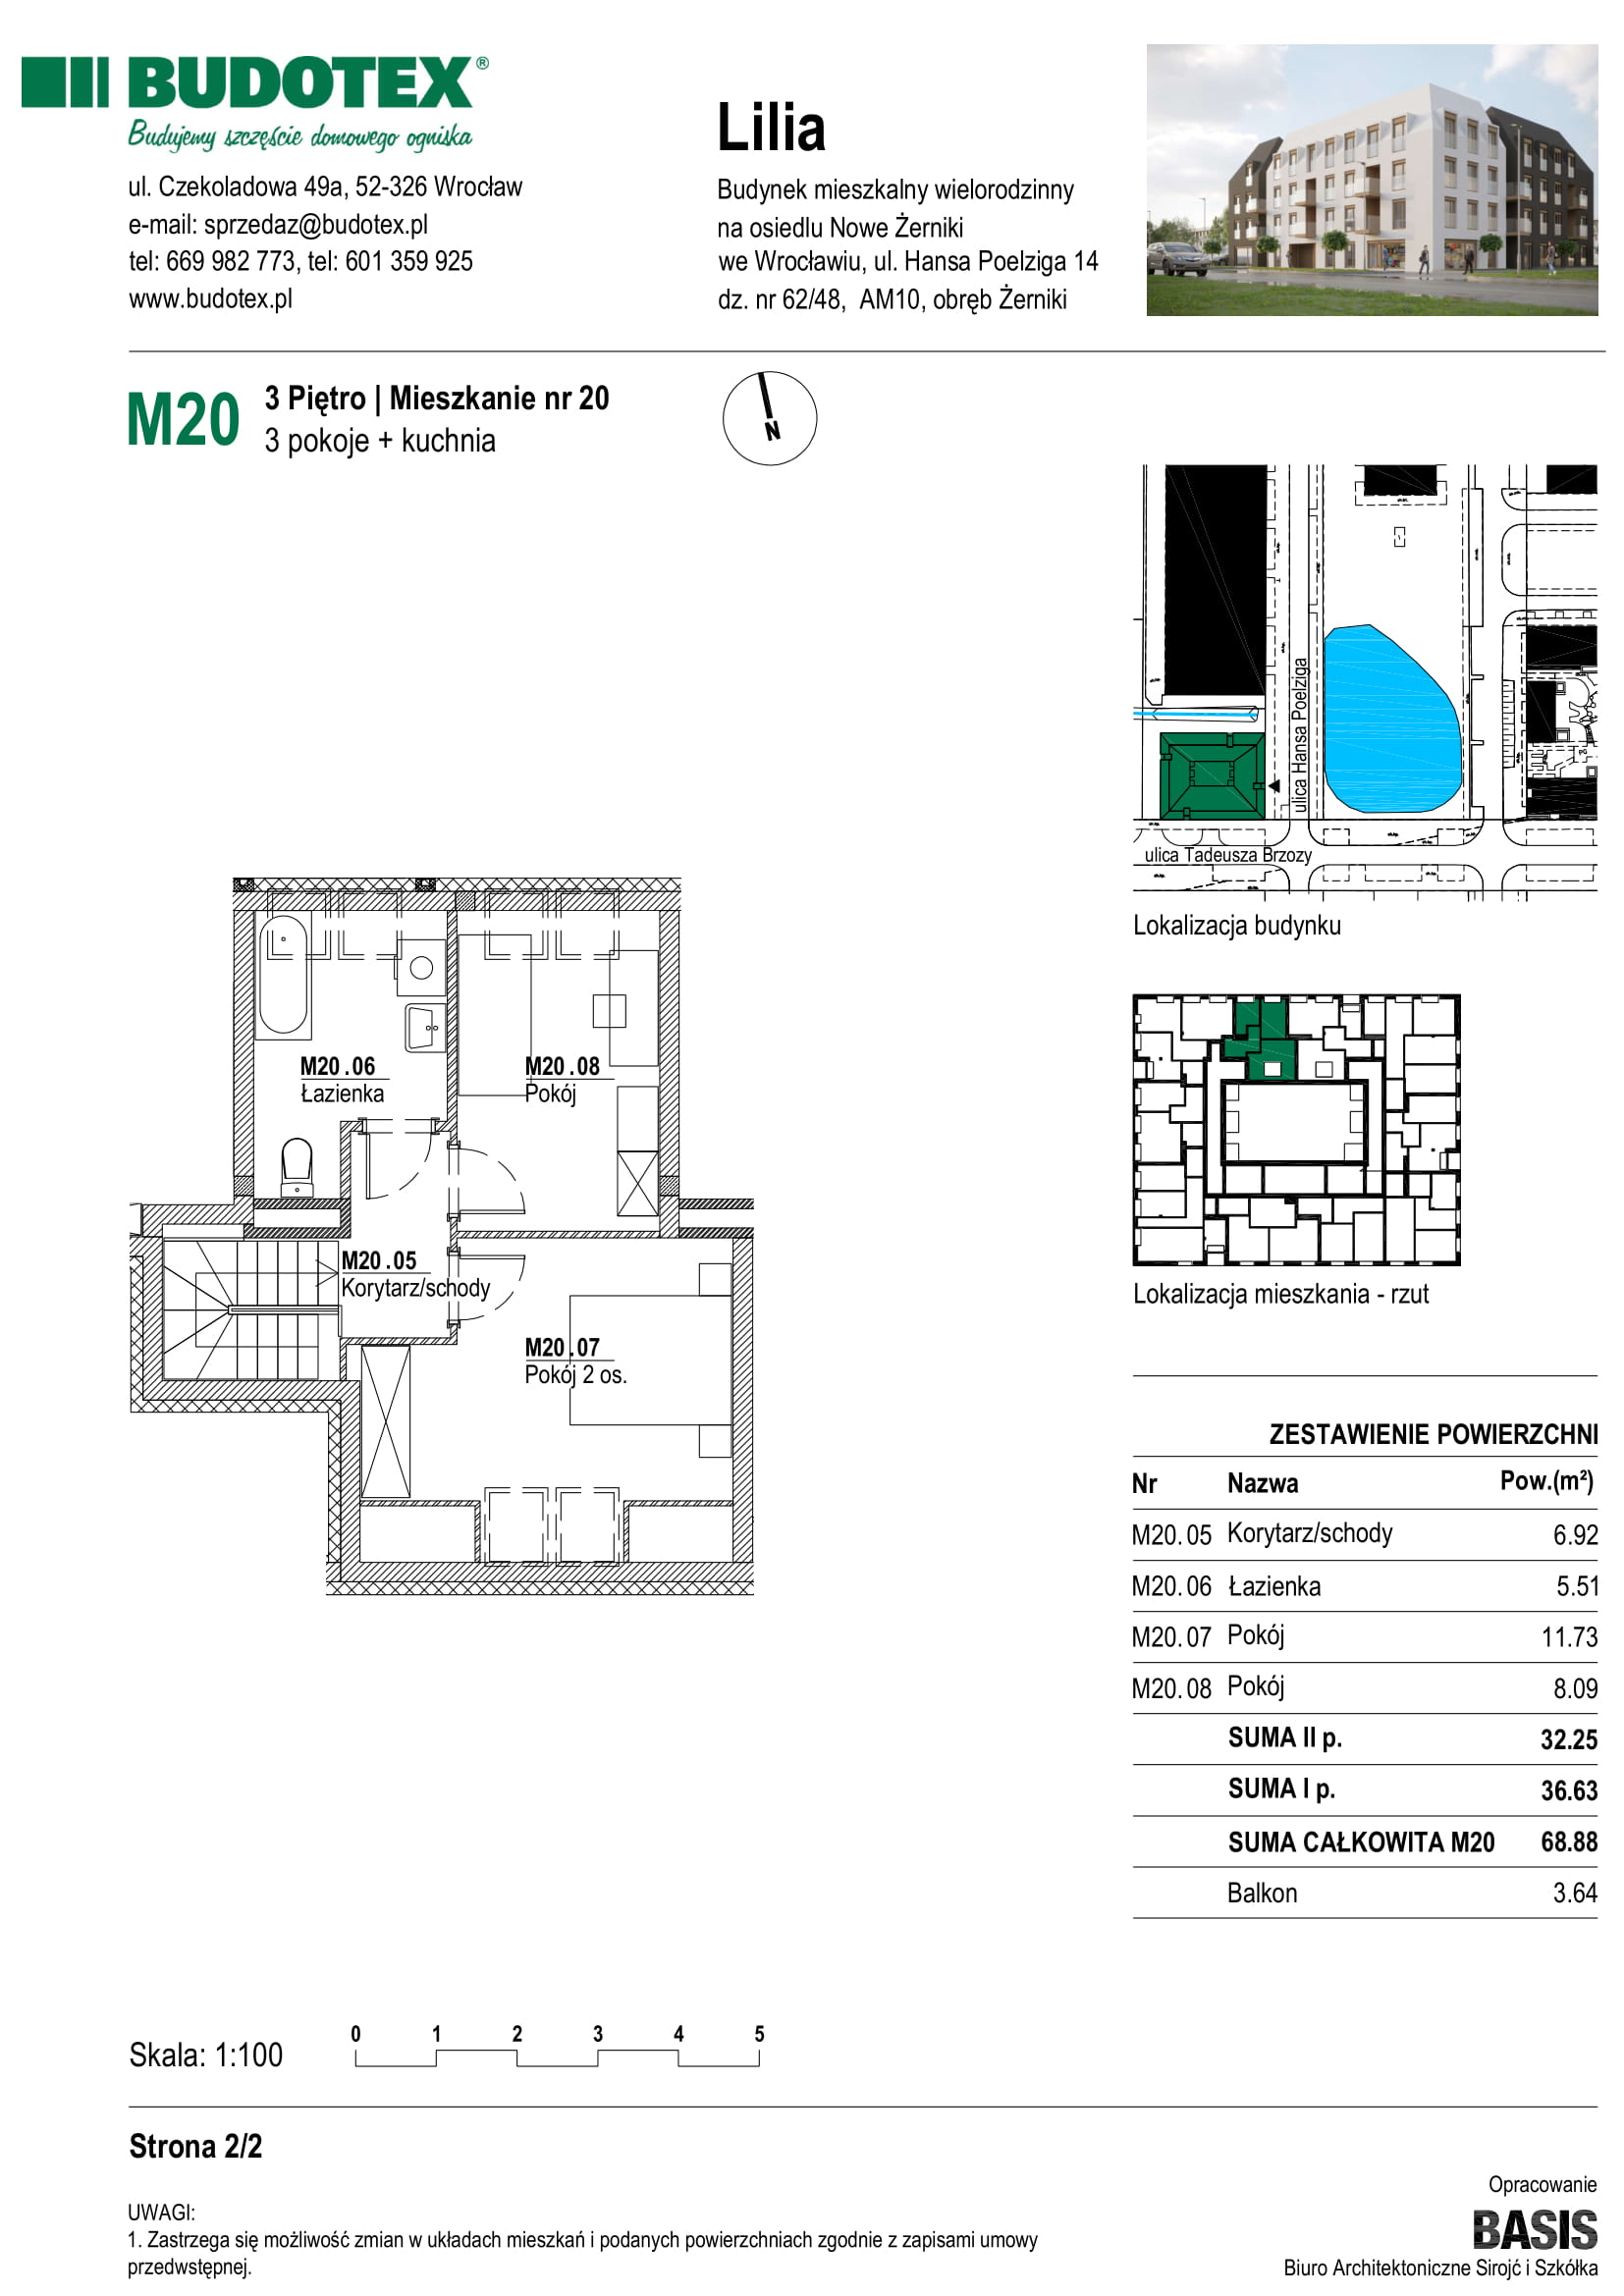 Mieszkanie nr M20